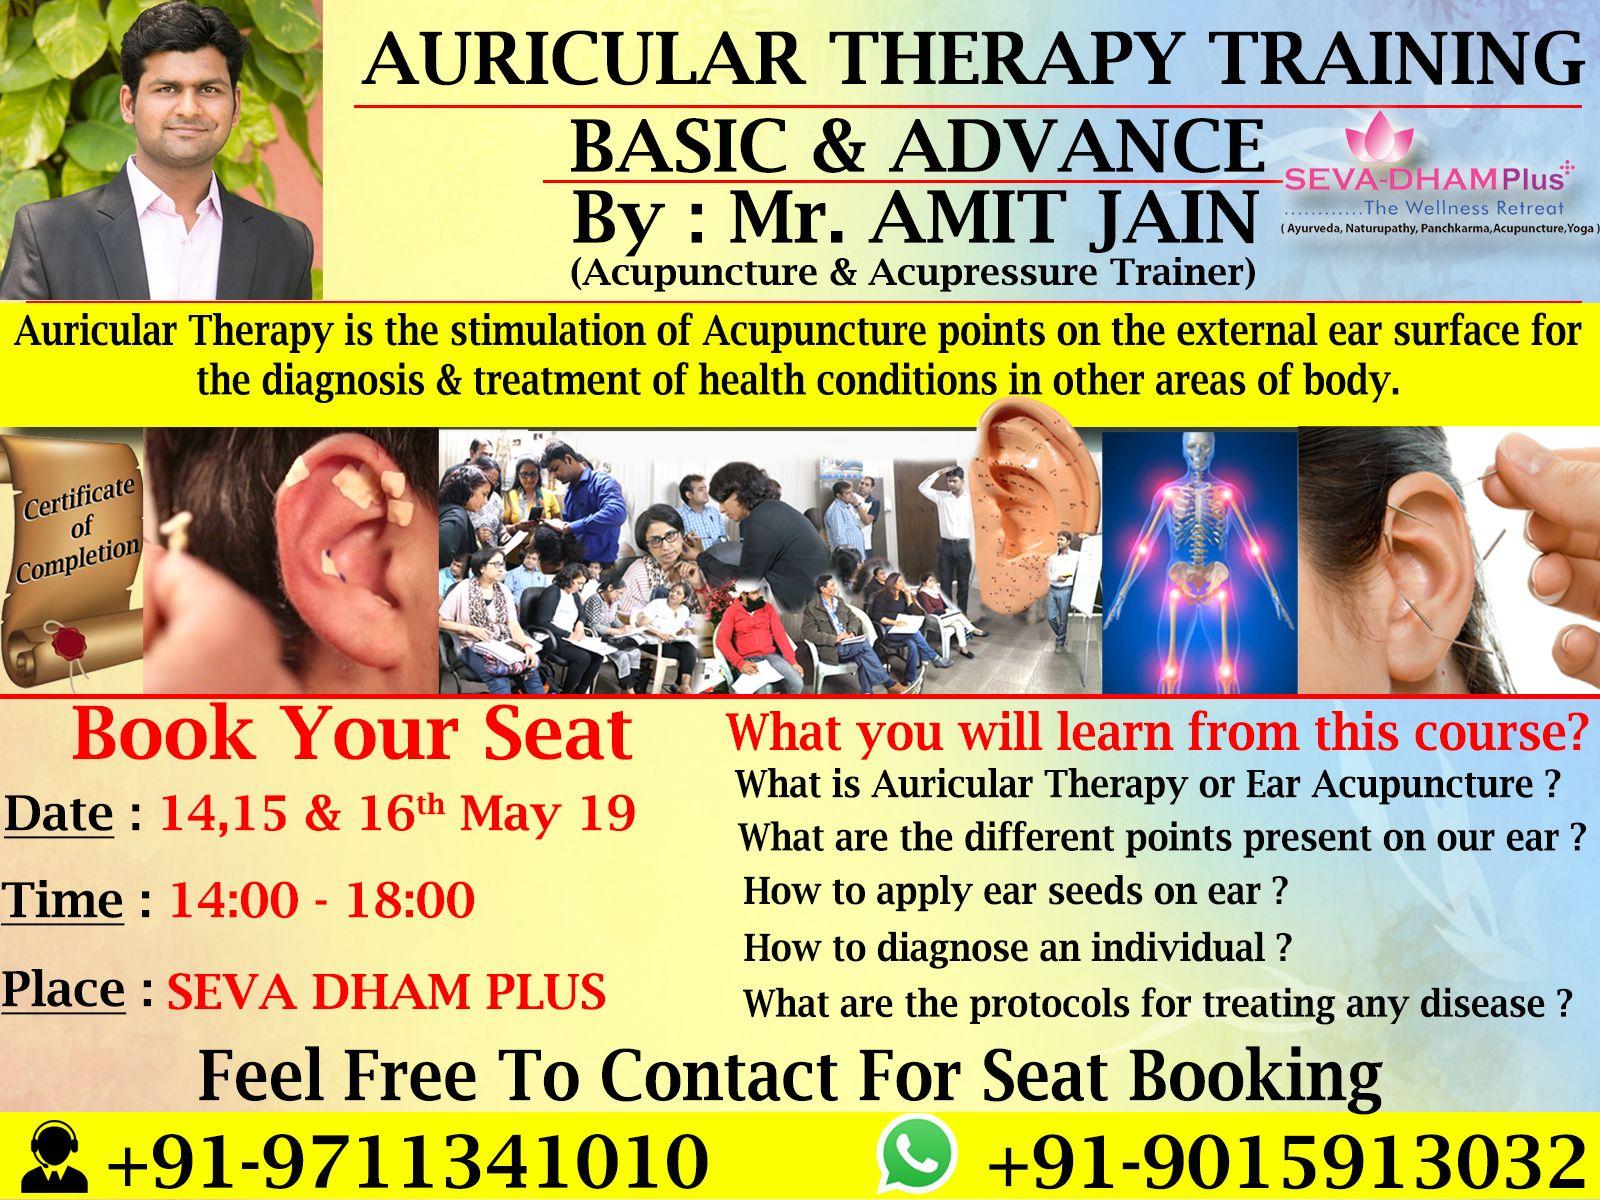 Learn ! Practice ! Heal Learn #Auricular #Therapy or #Ear